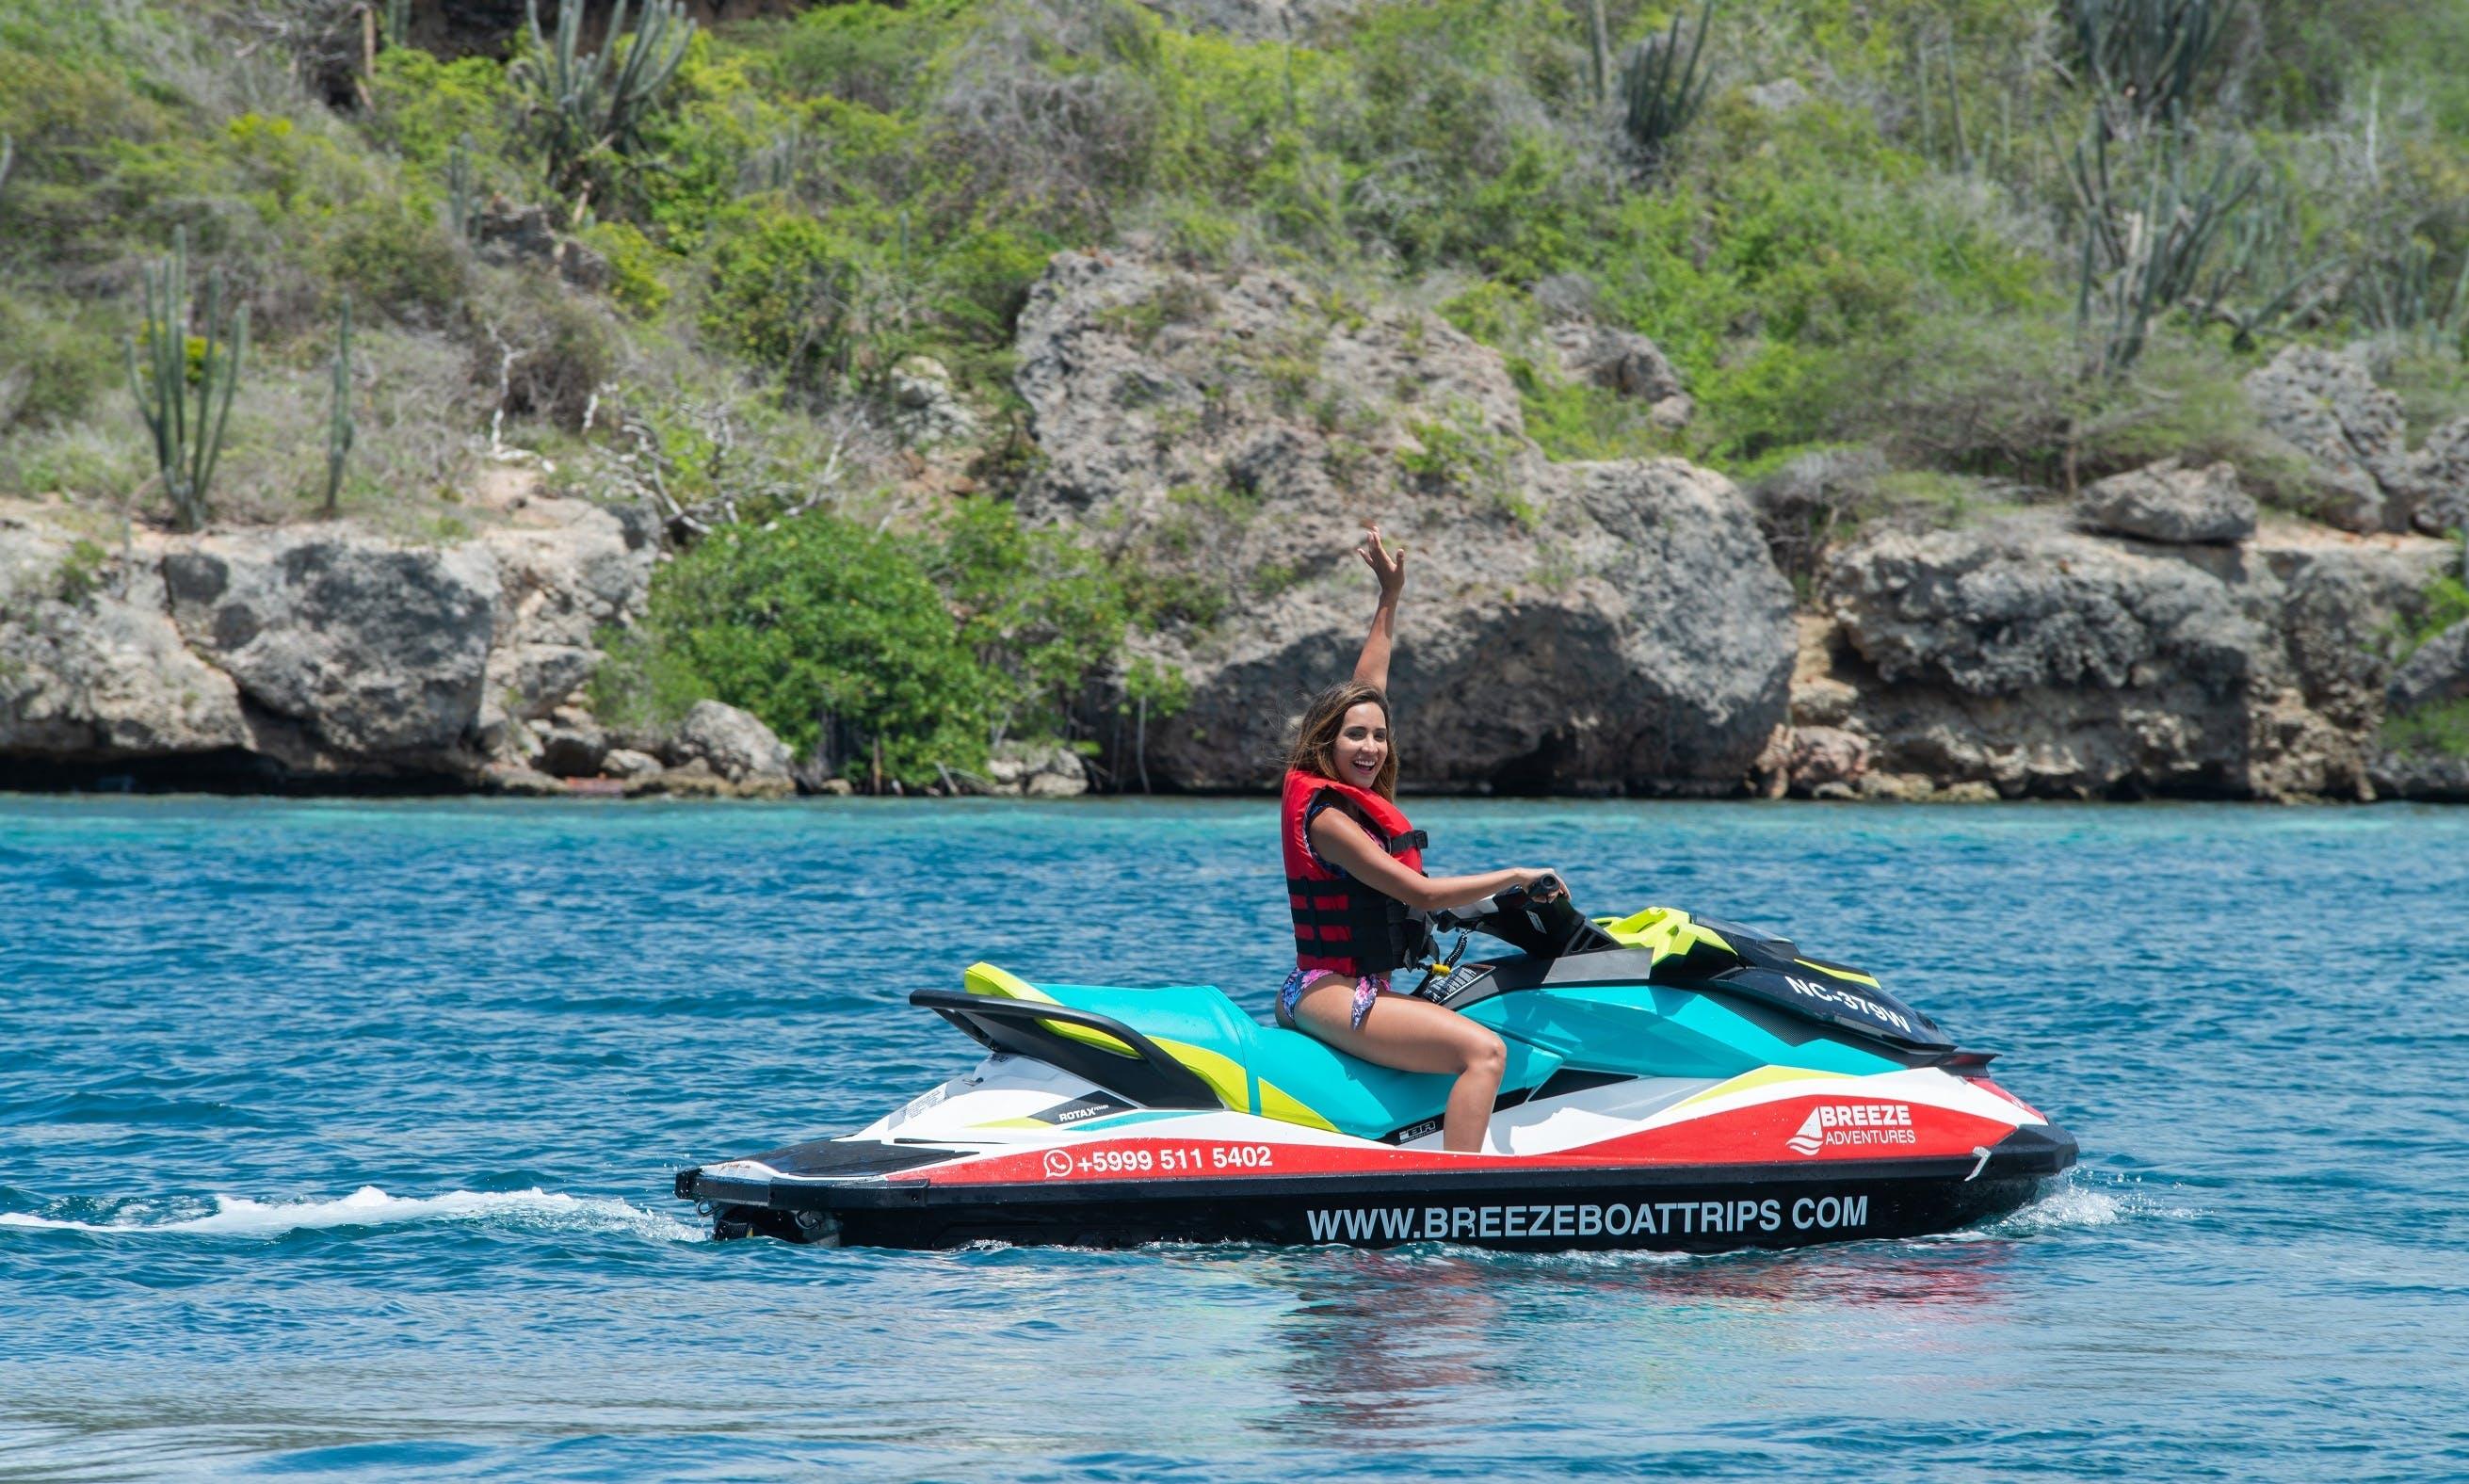 JetSki Adventure at the Santa Barbara Beach & Golf Resort, Curacao